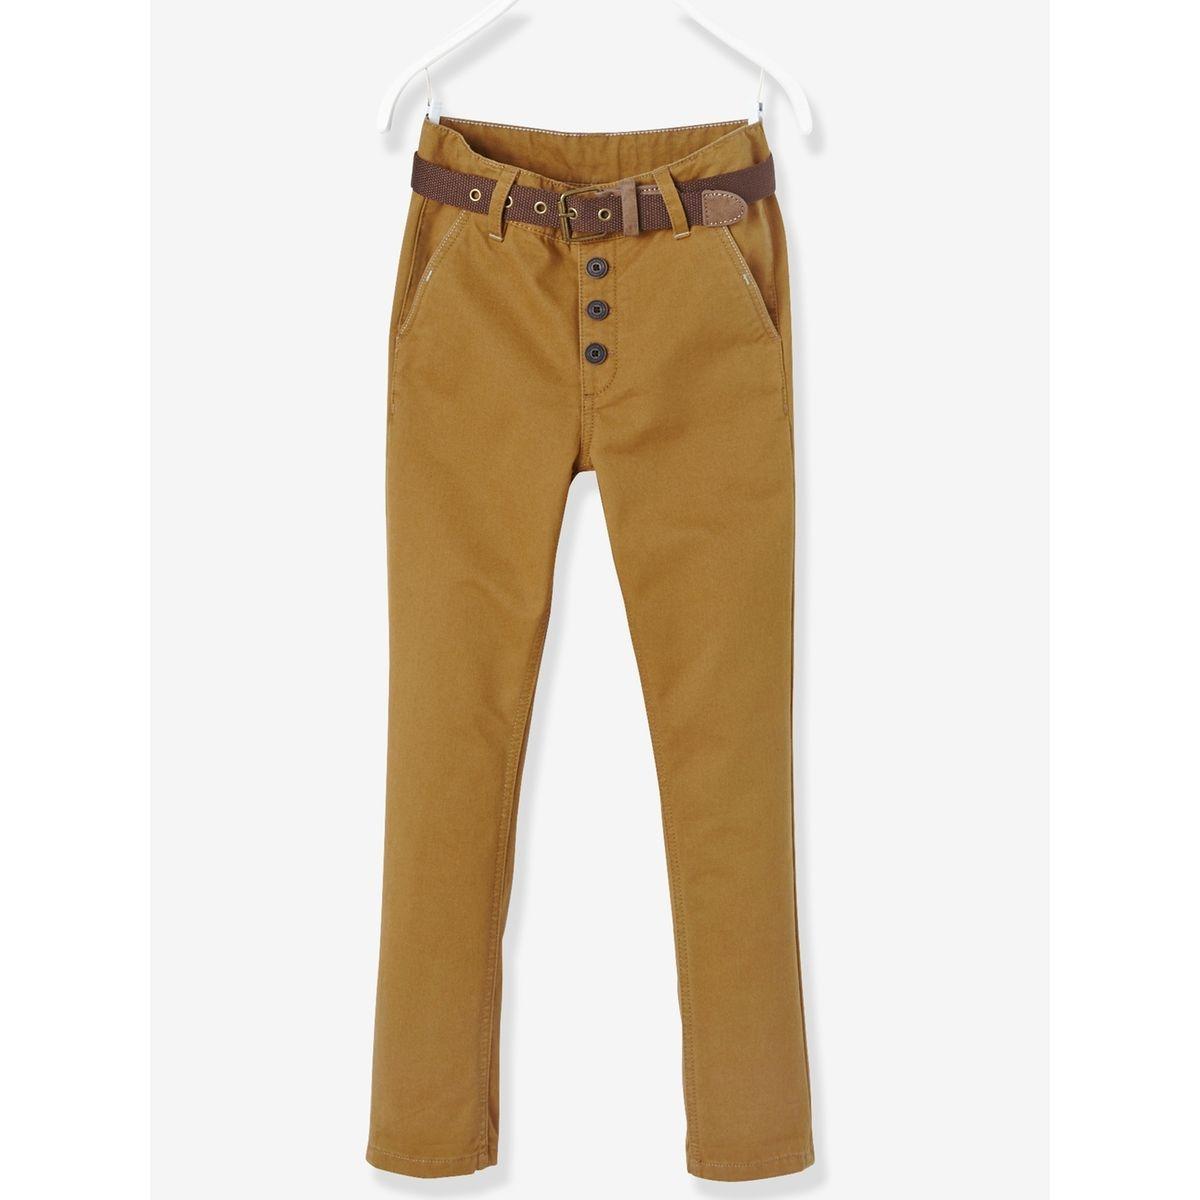 pantalon chino gar on avec ceinture. Black Bedroom Furniture Sets. Home Design Ideas